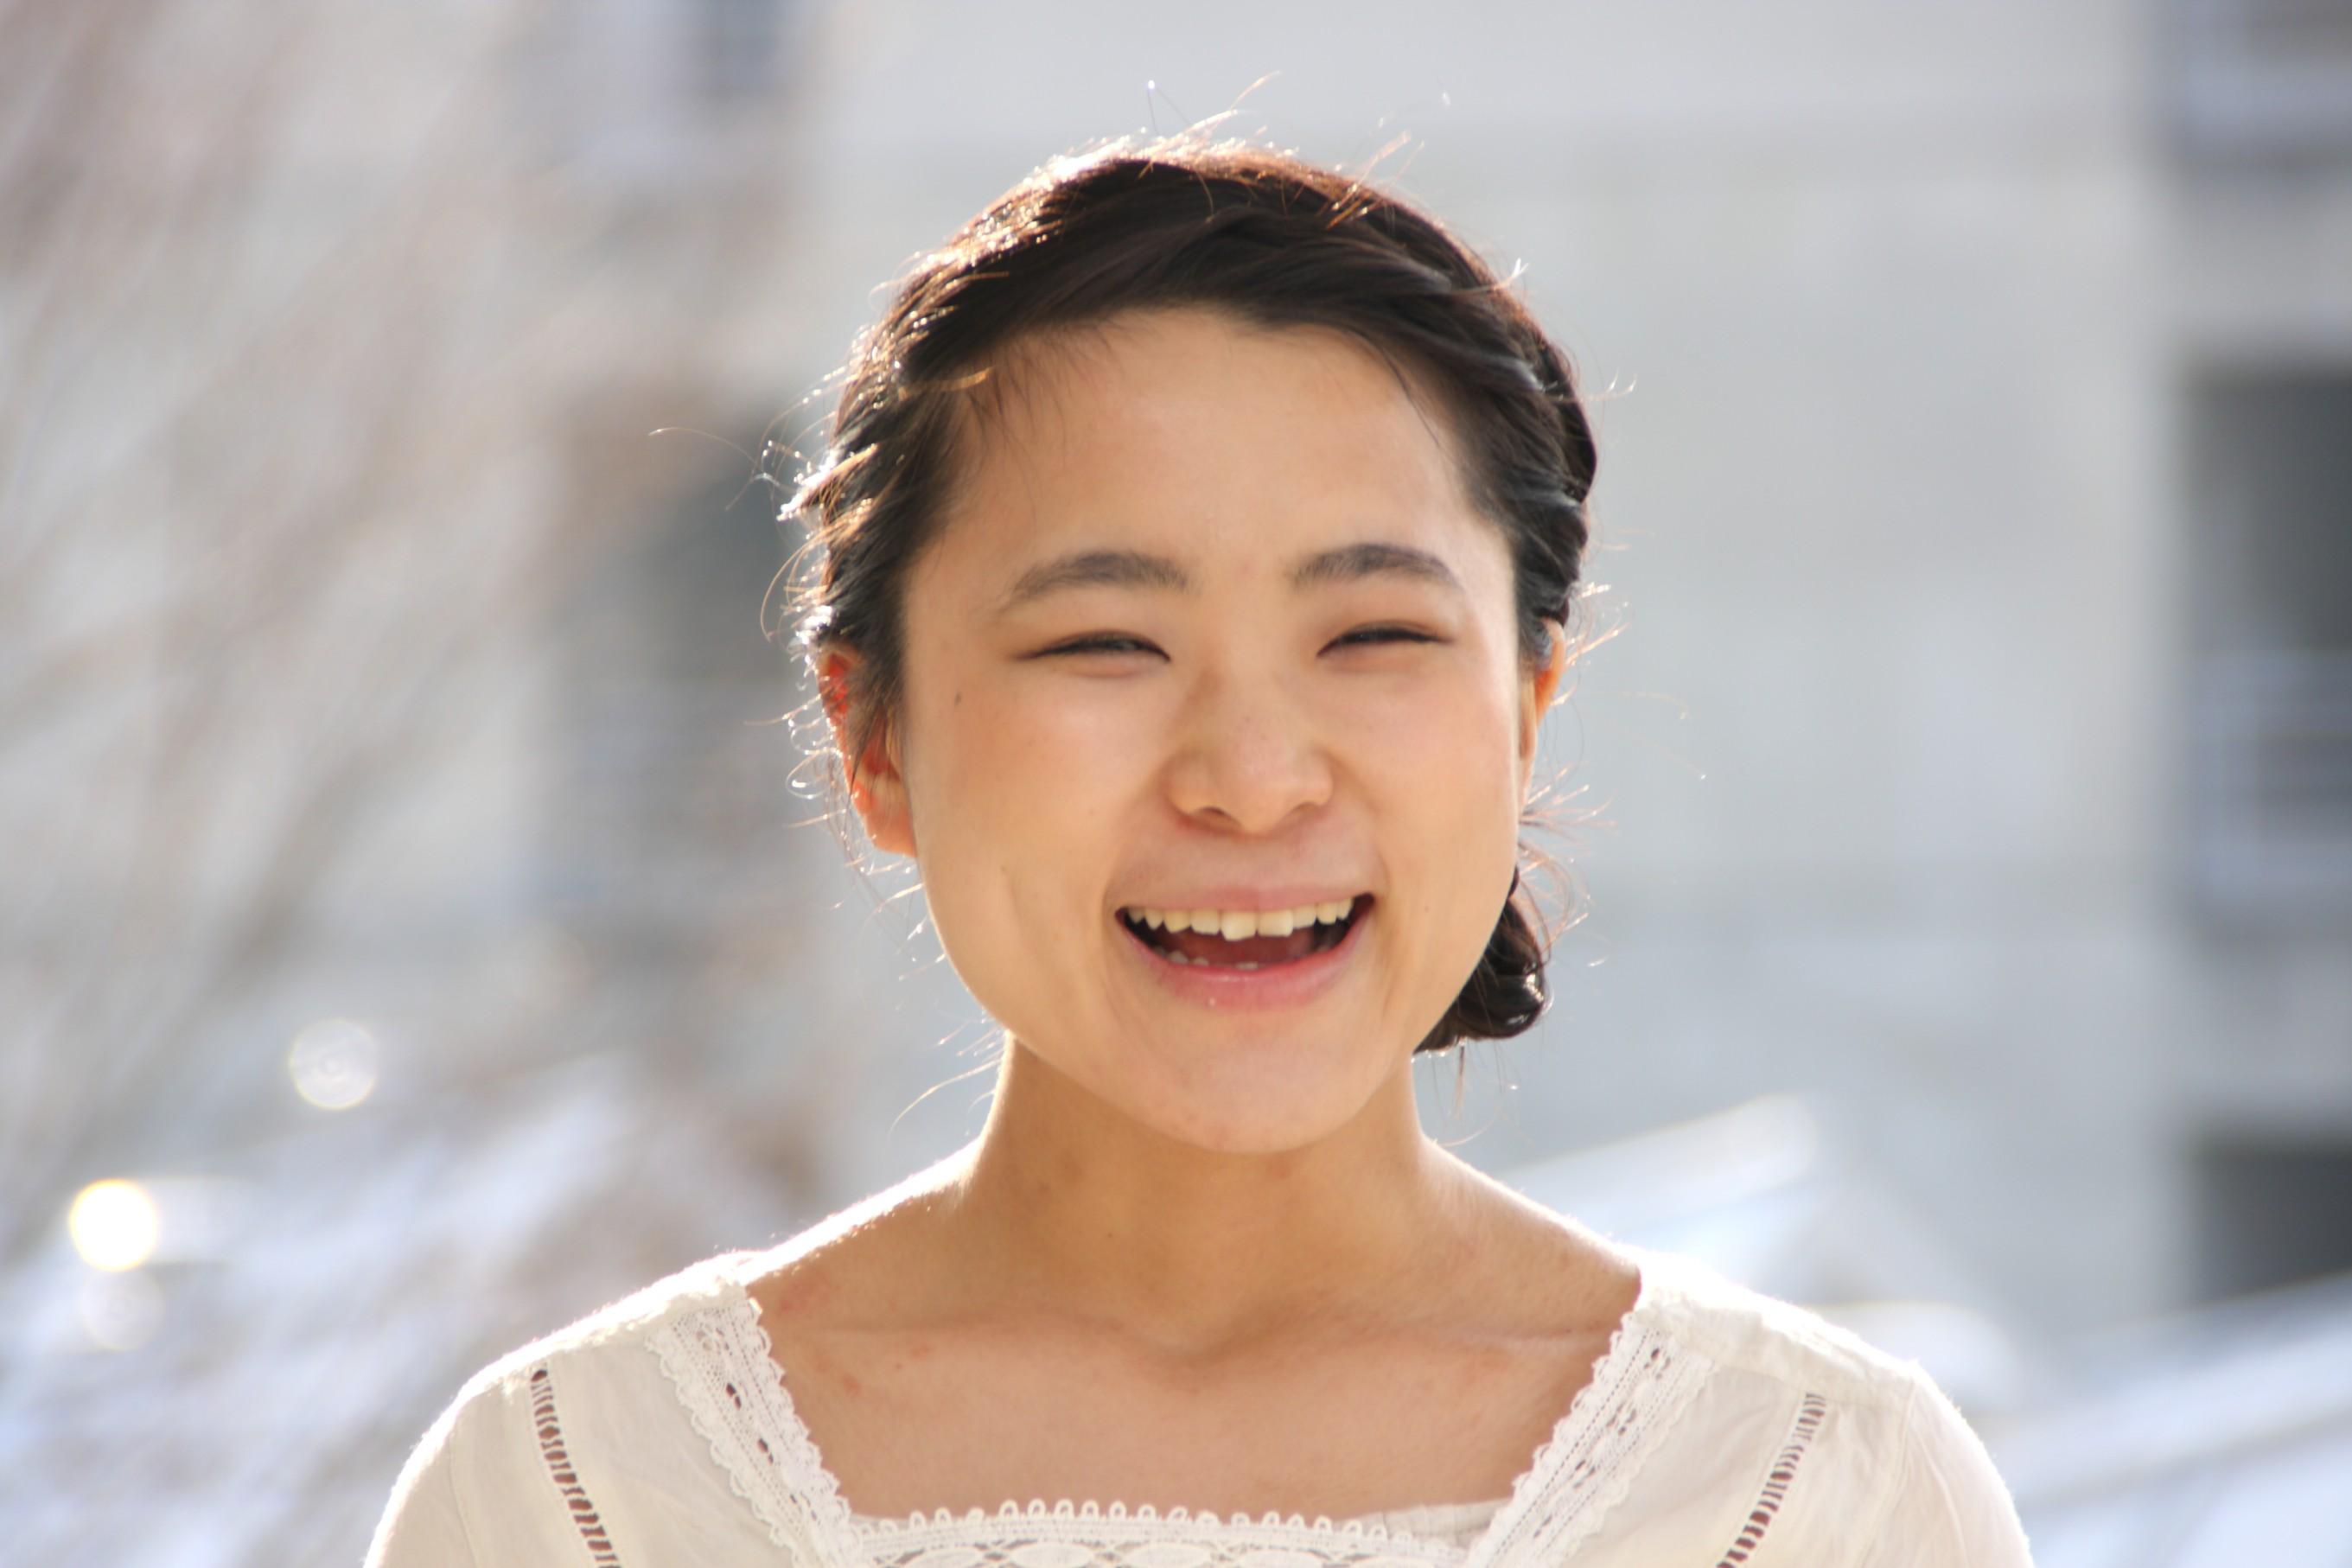 Tomoko Abe: jazz vocalist, composer, arranger who originally from Sapporo, Japan